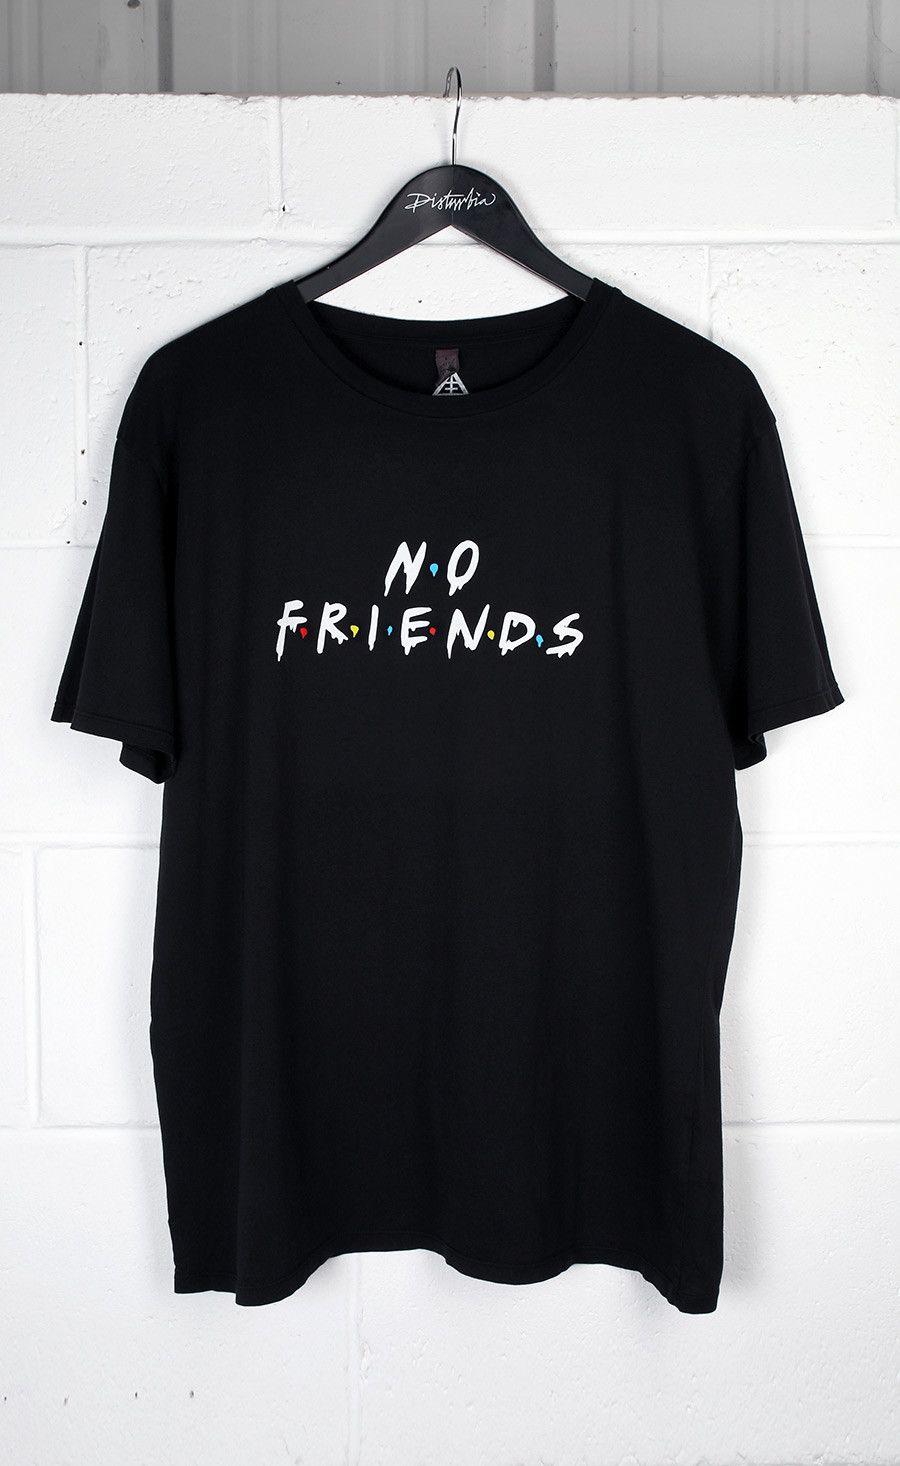 29921814b No Friends T-Shirt #disturbiaclothing disturbia metal silver alien goth  occult grunge alternative punk